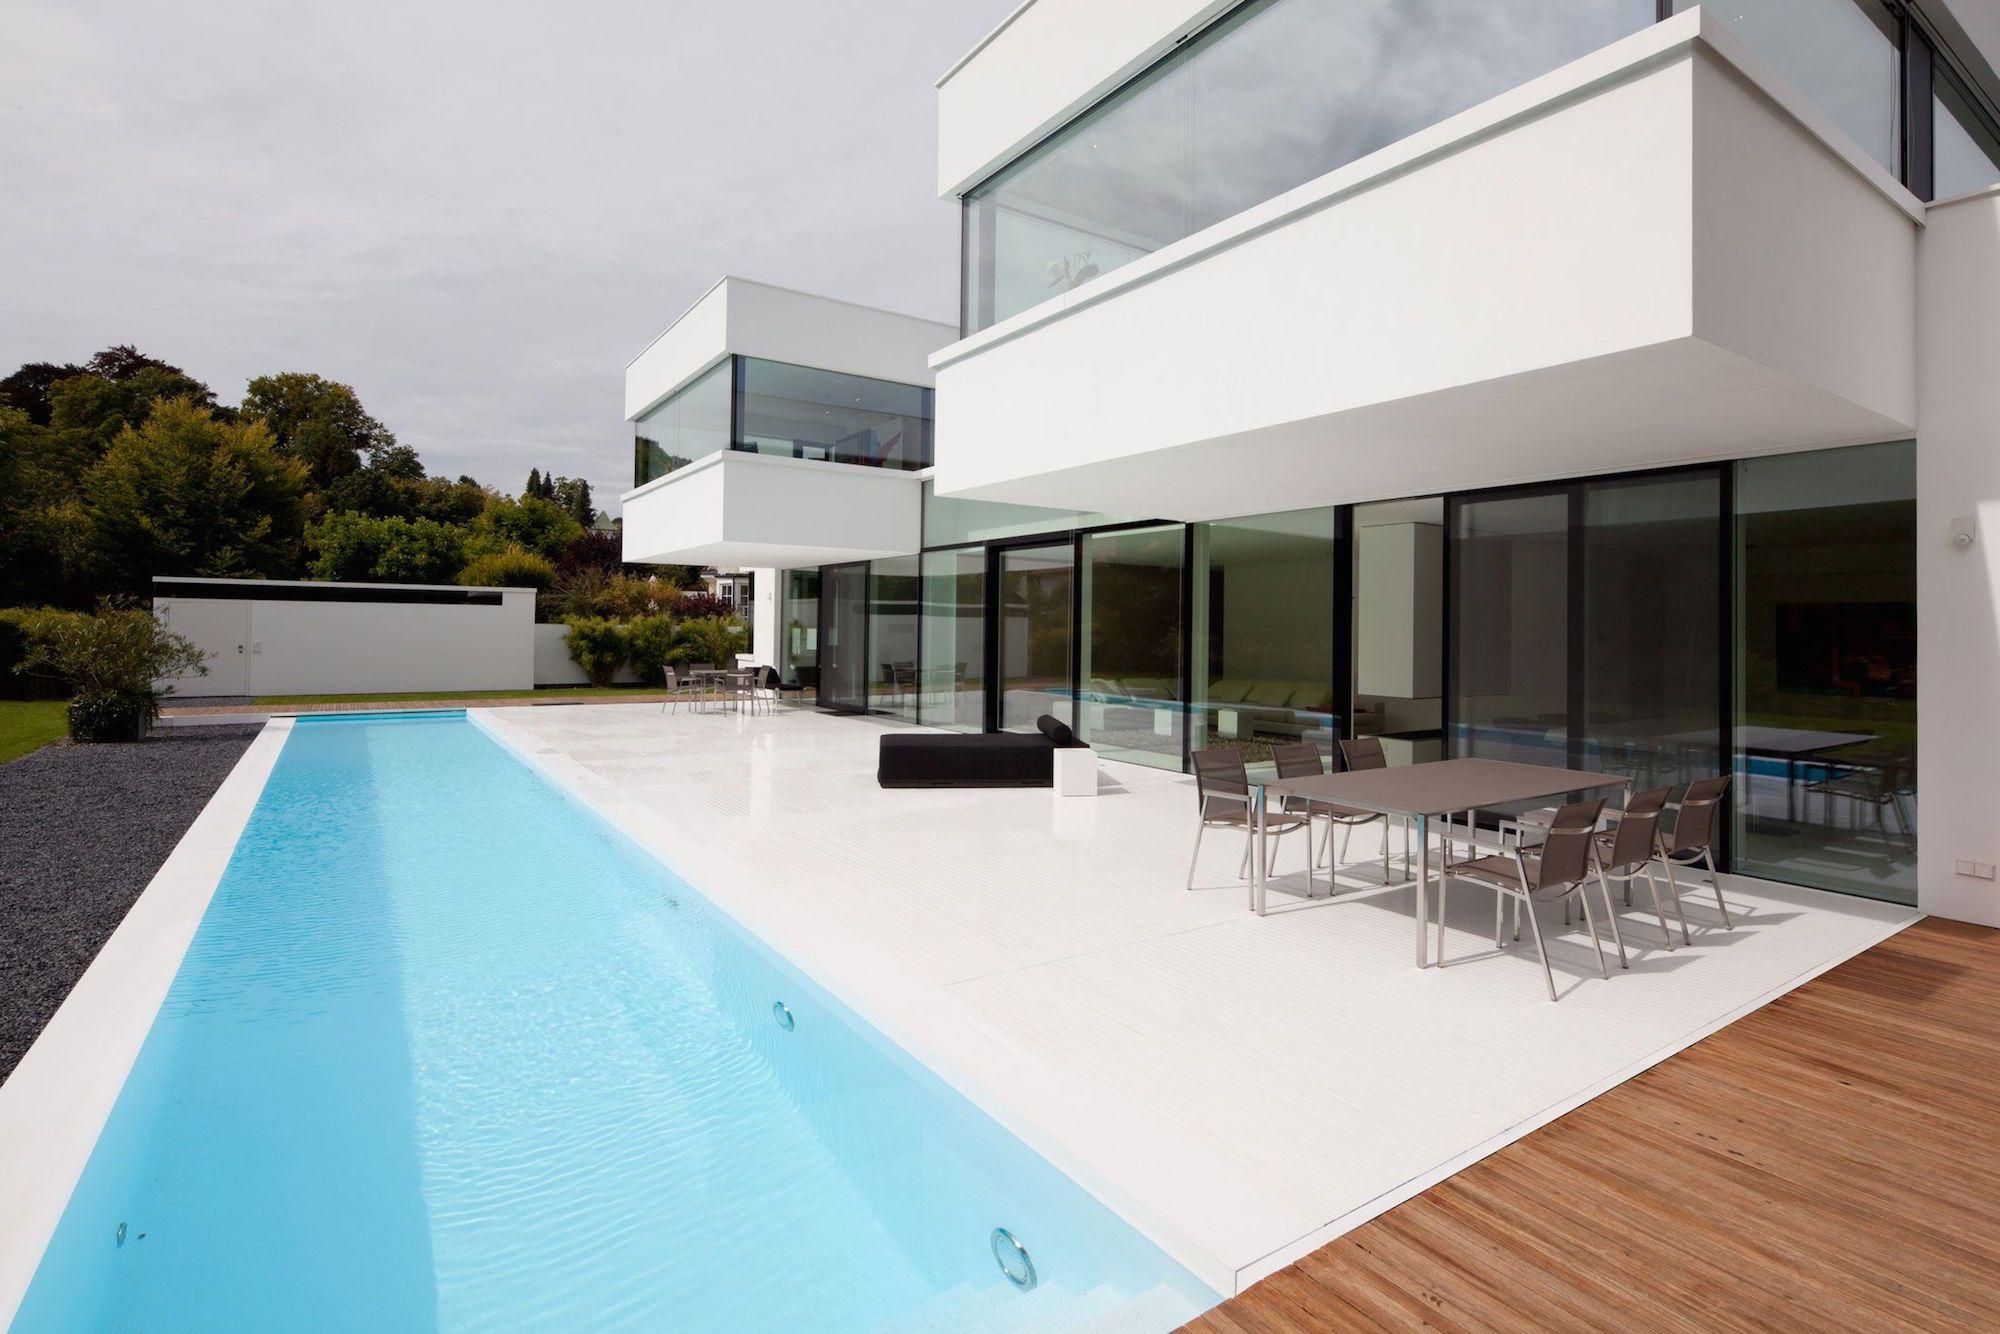 The Modern HI MACS House by Karl Dreer and Bemb Dellinger